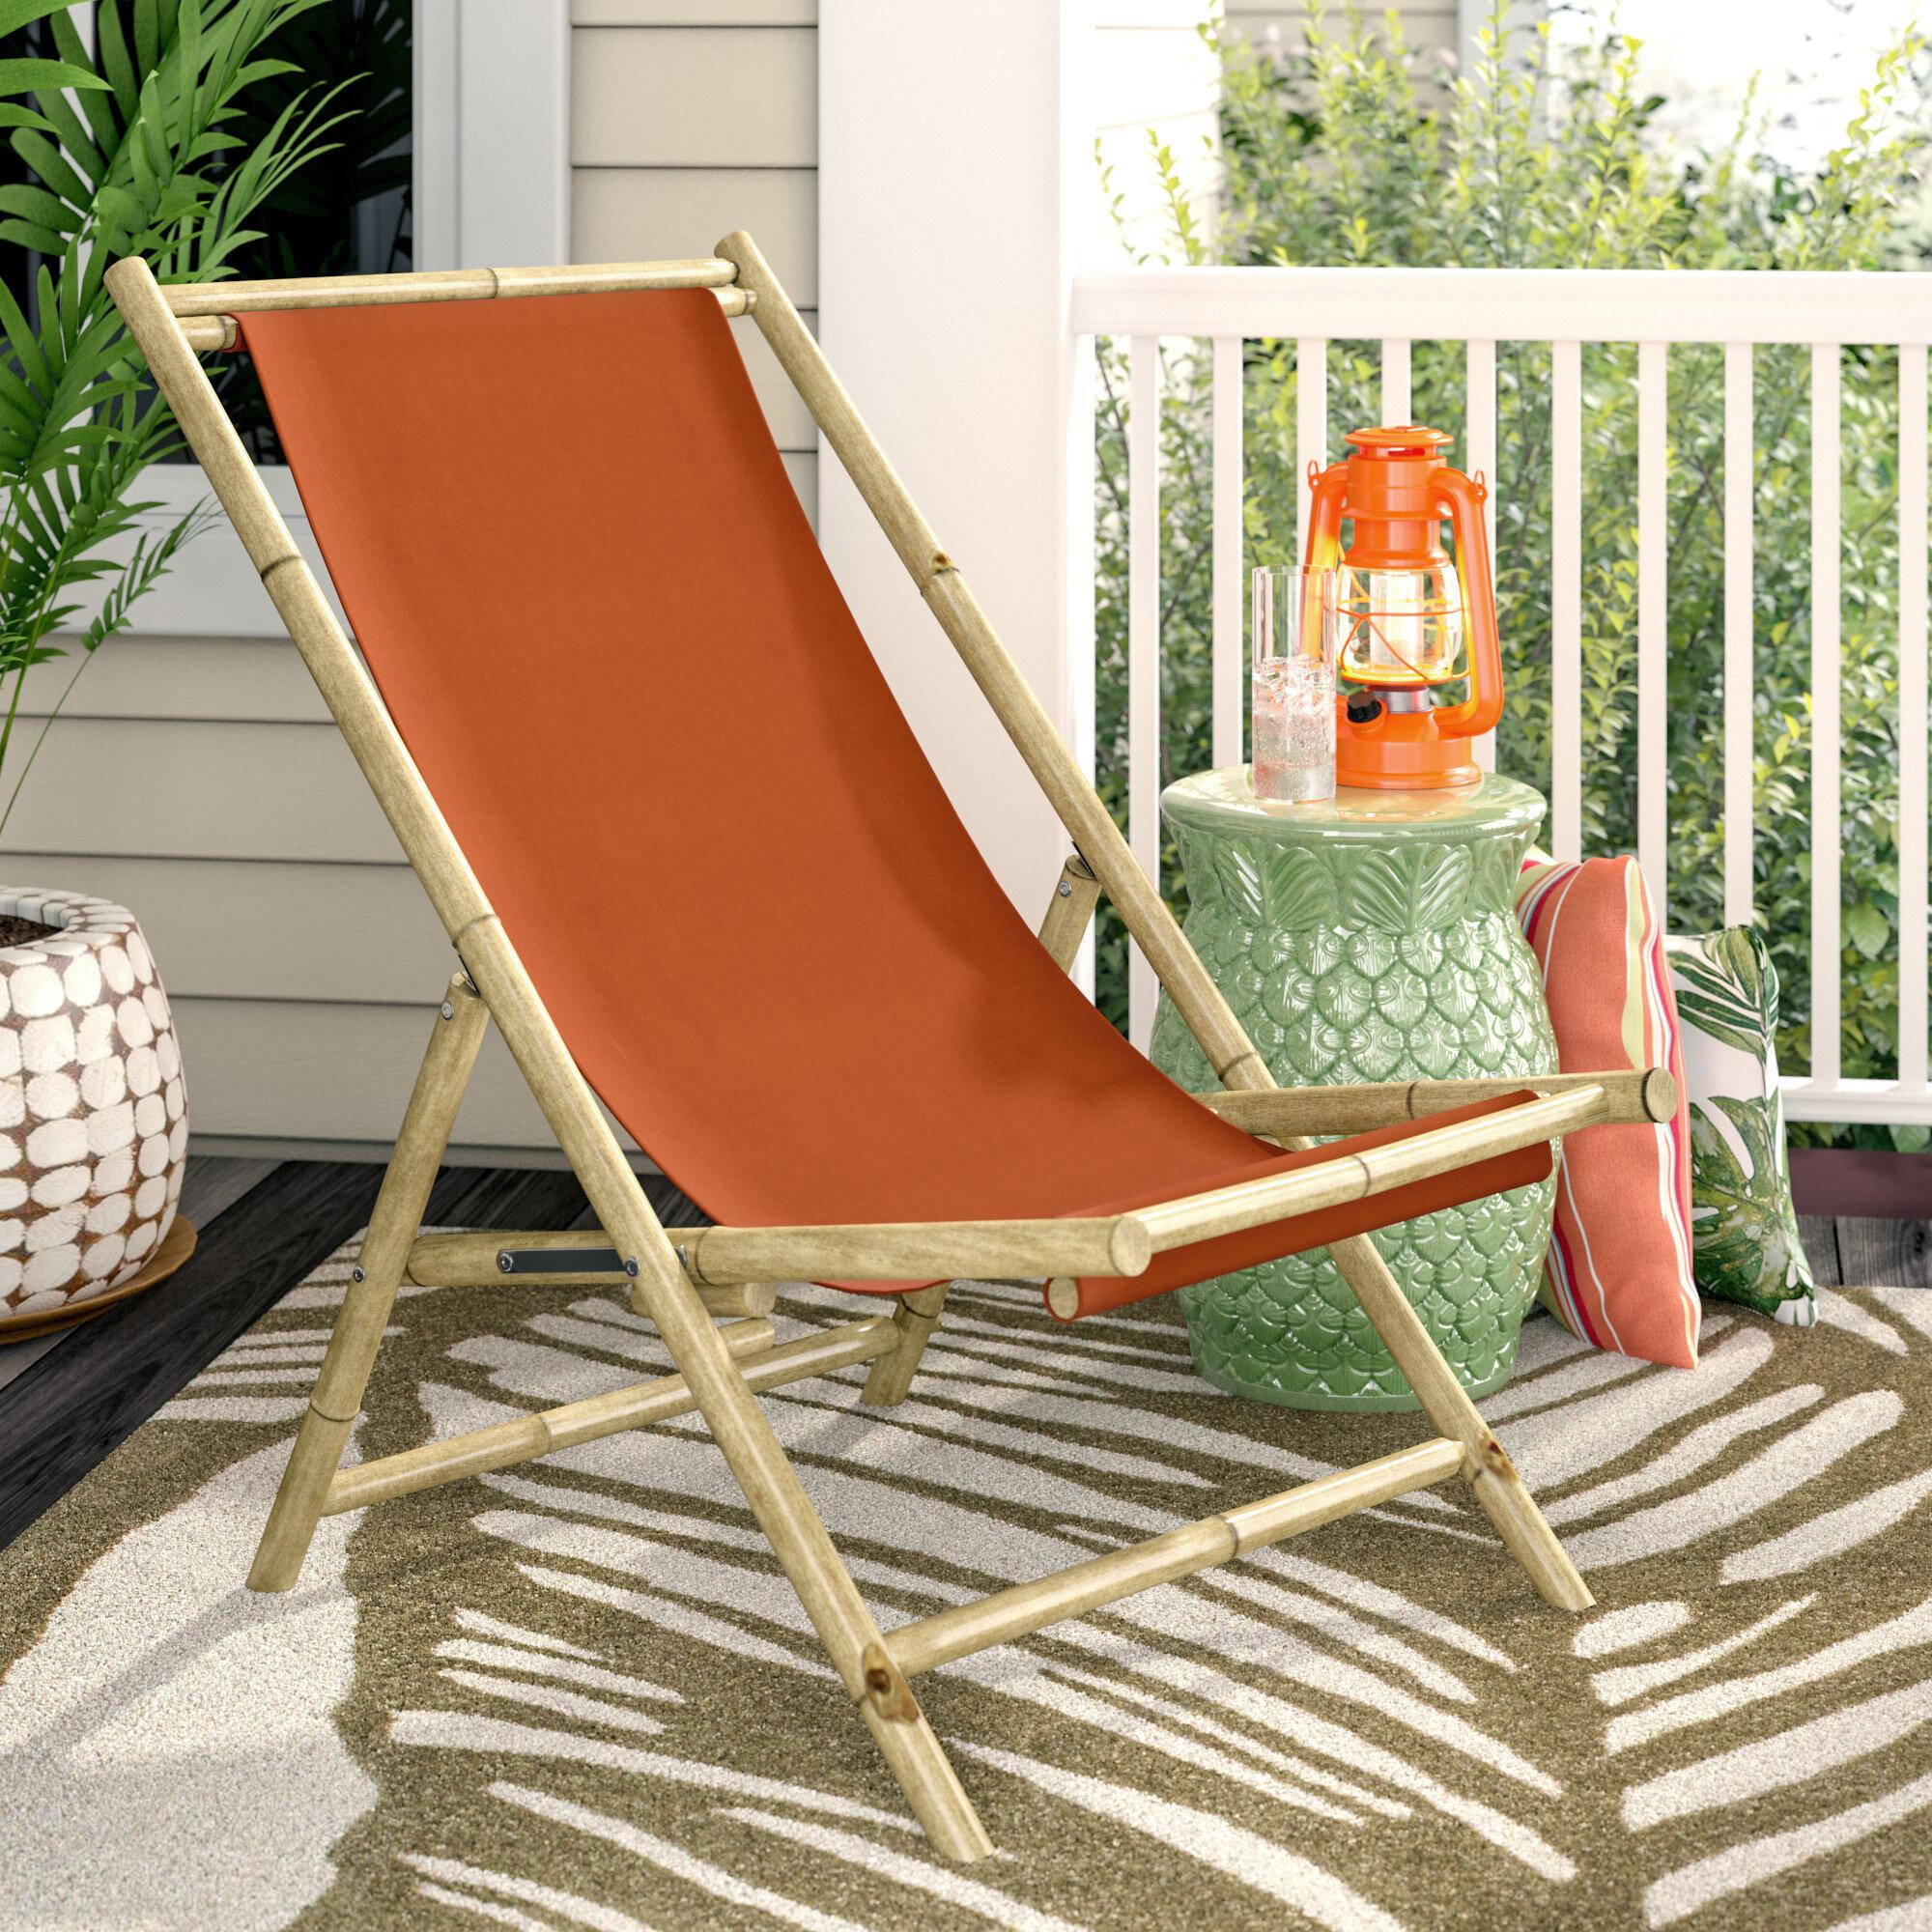 Fabulous Atalya Folding Bamboo Relax Sling Beach Chair Inzonedesignstudio Interior Chair Design Inzonedesignstudiocom